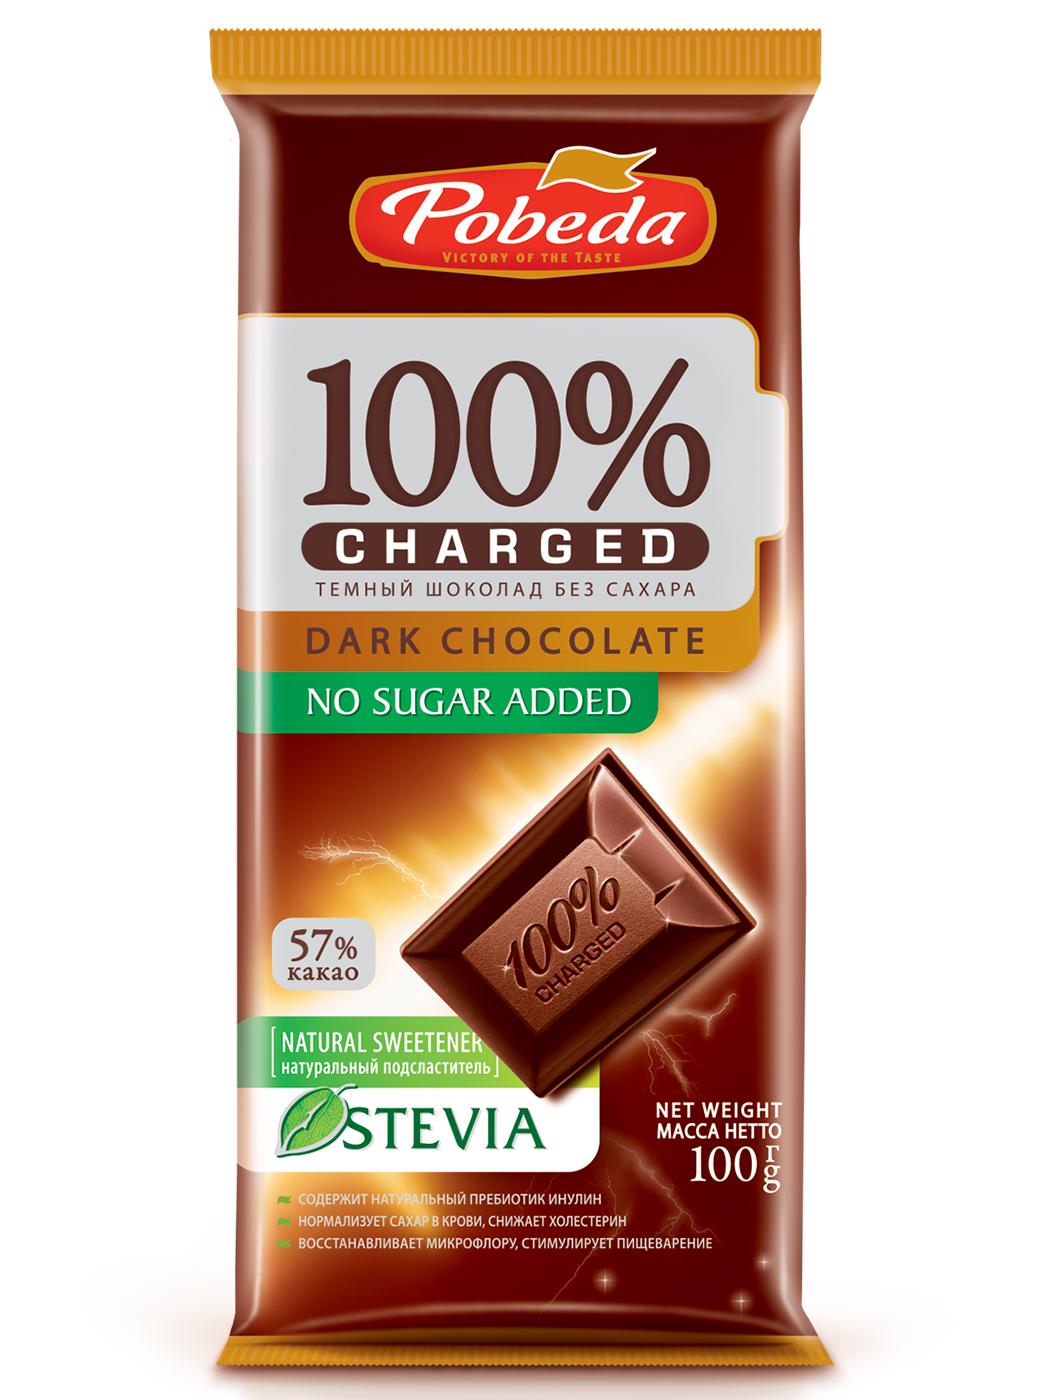 Шоколад темный Победа Вкуса без добавления сахара 57% какао чаржед фото